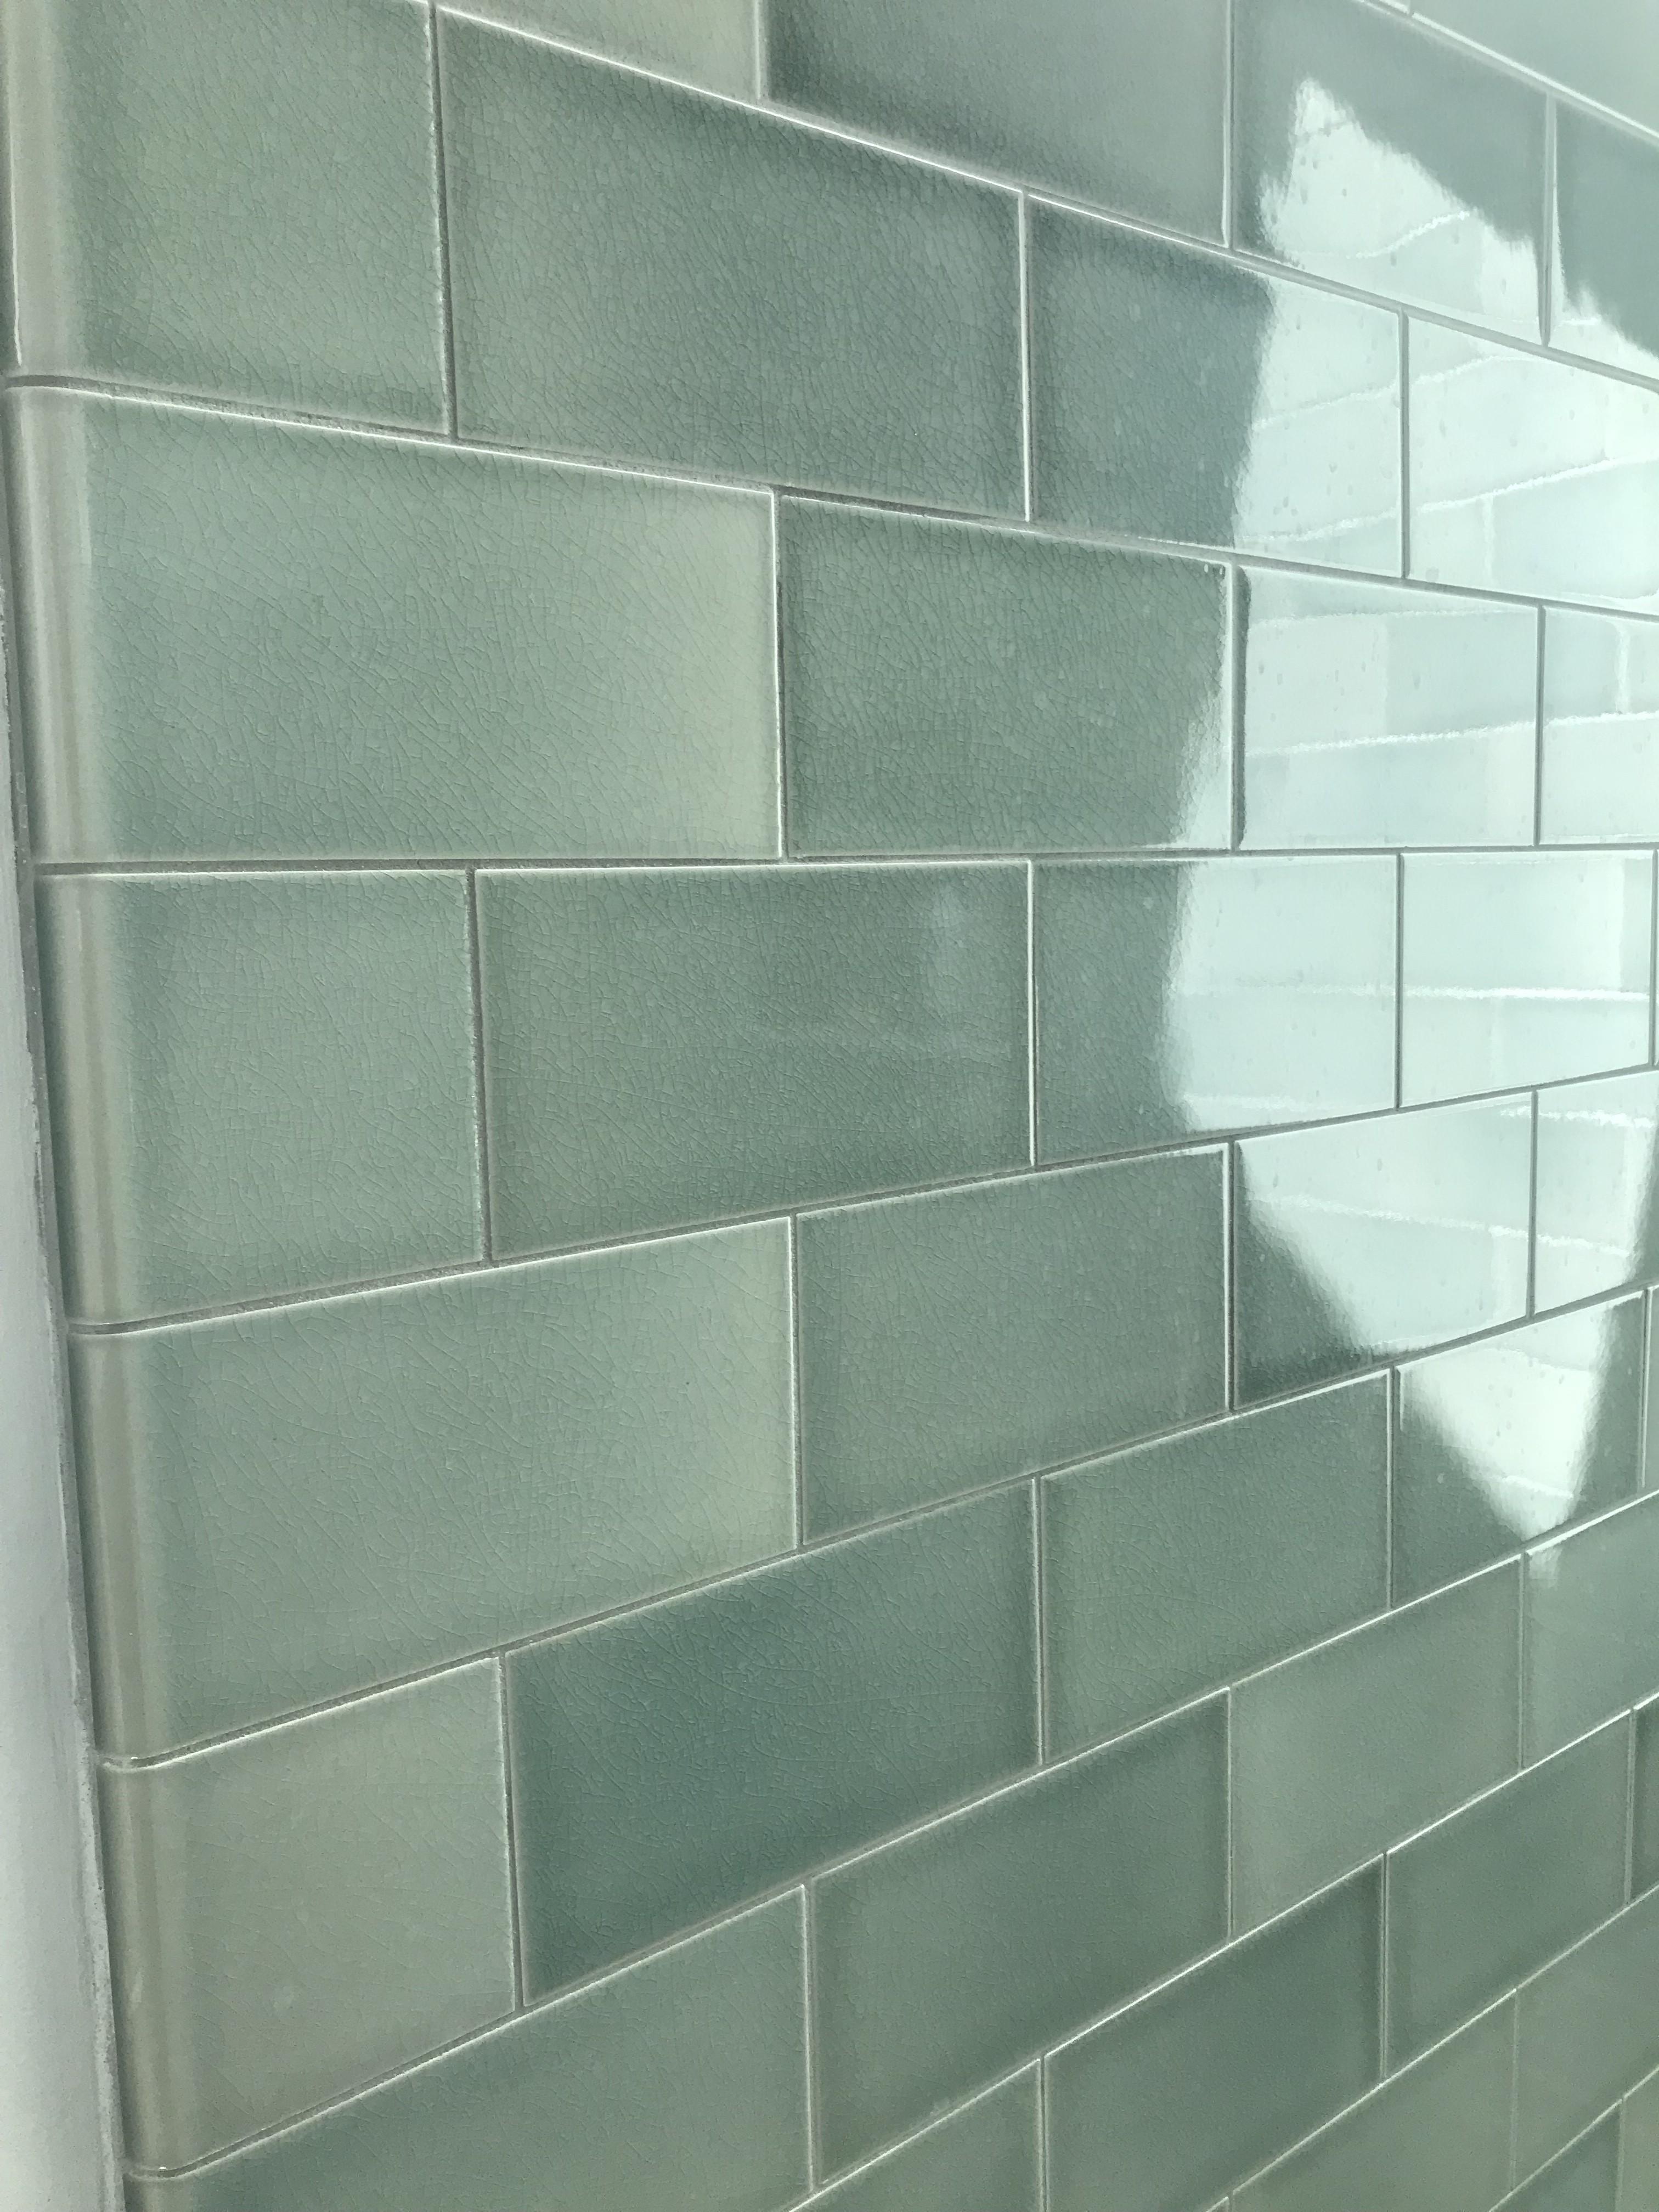 Subway Ceramicssubway Ceramics 3x6 Field Tile Celadon